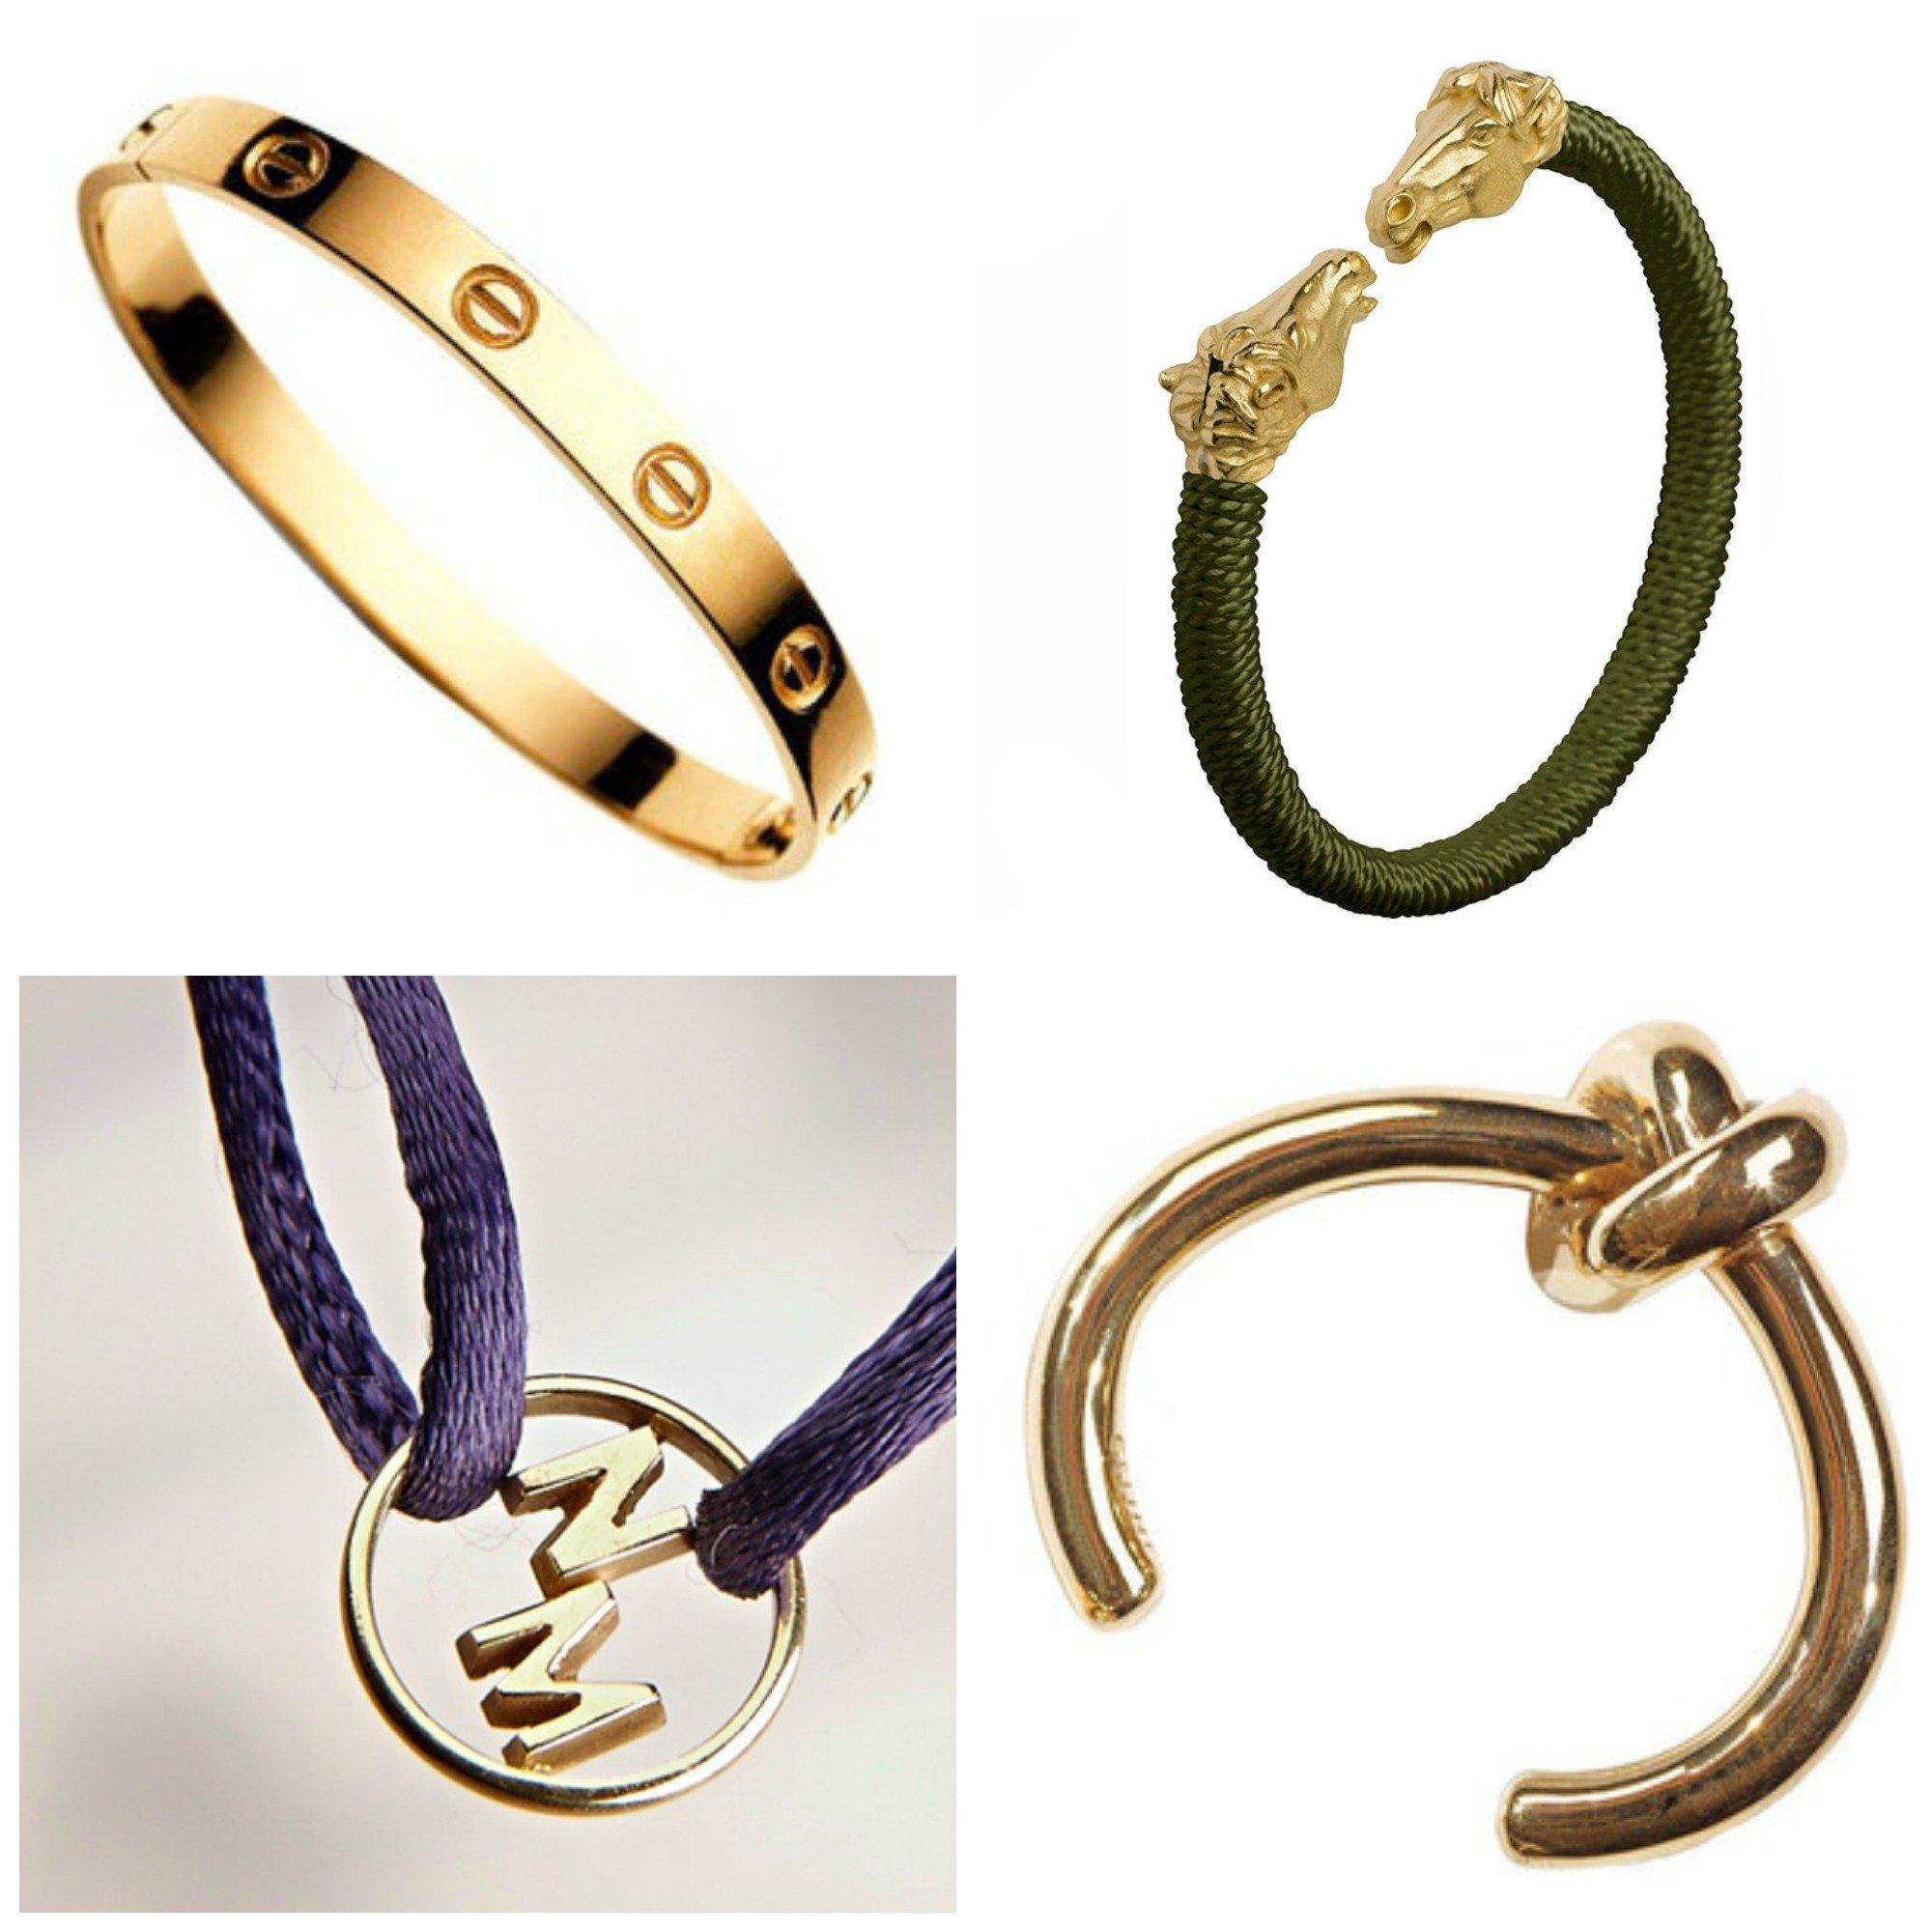 cartier love bracelet zodiac minitials celine knot bracelet maria kooistra. Black Bedroom Furniture Sets. Home Design Ideas